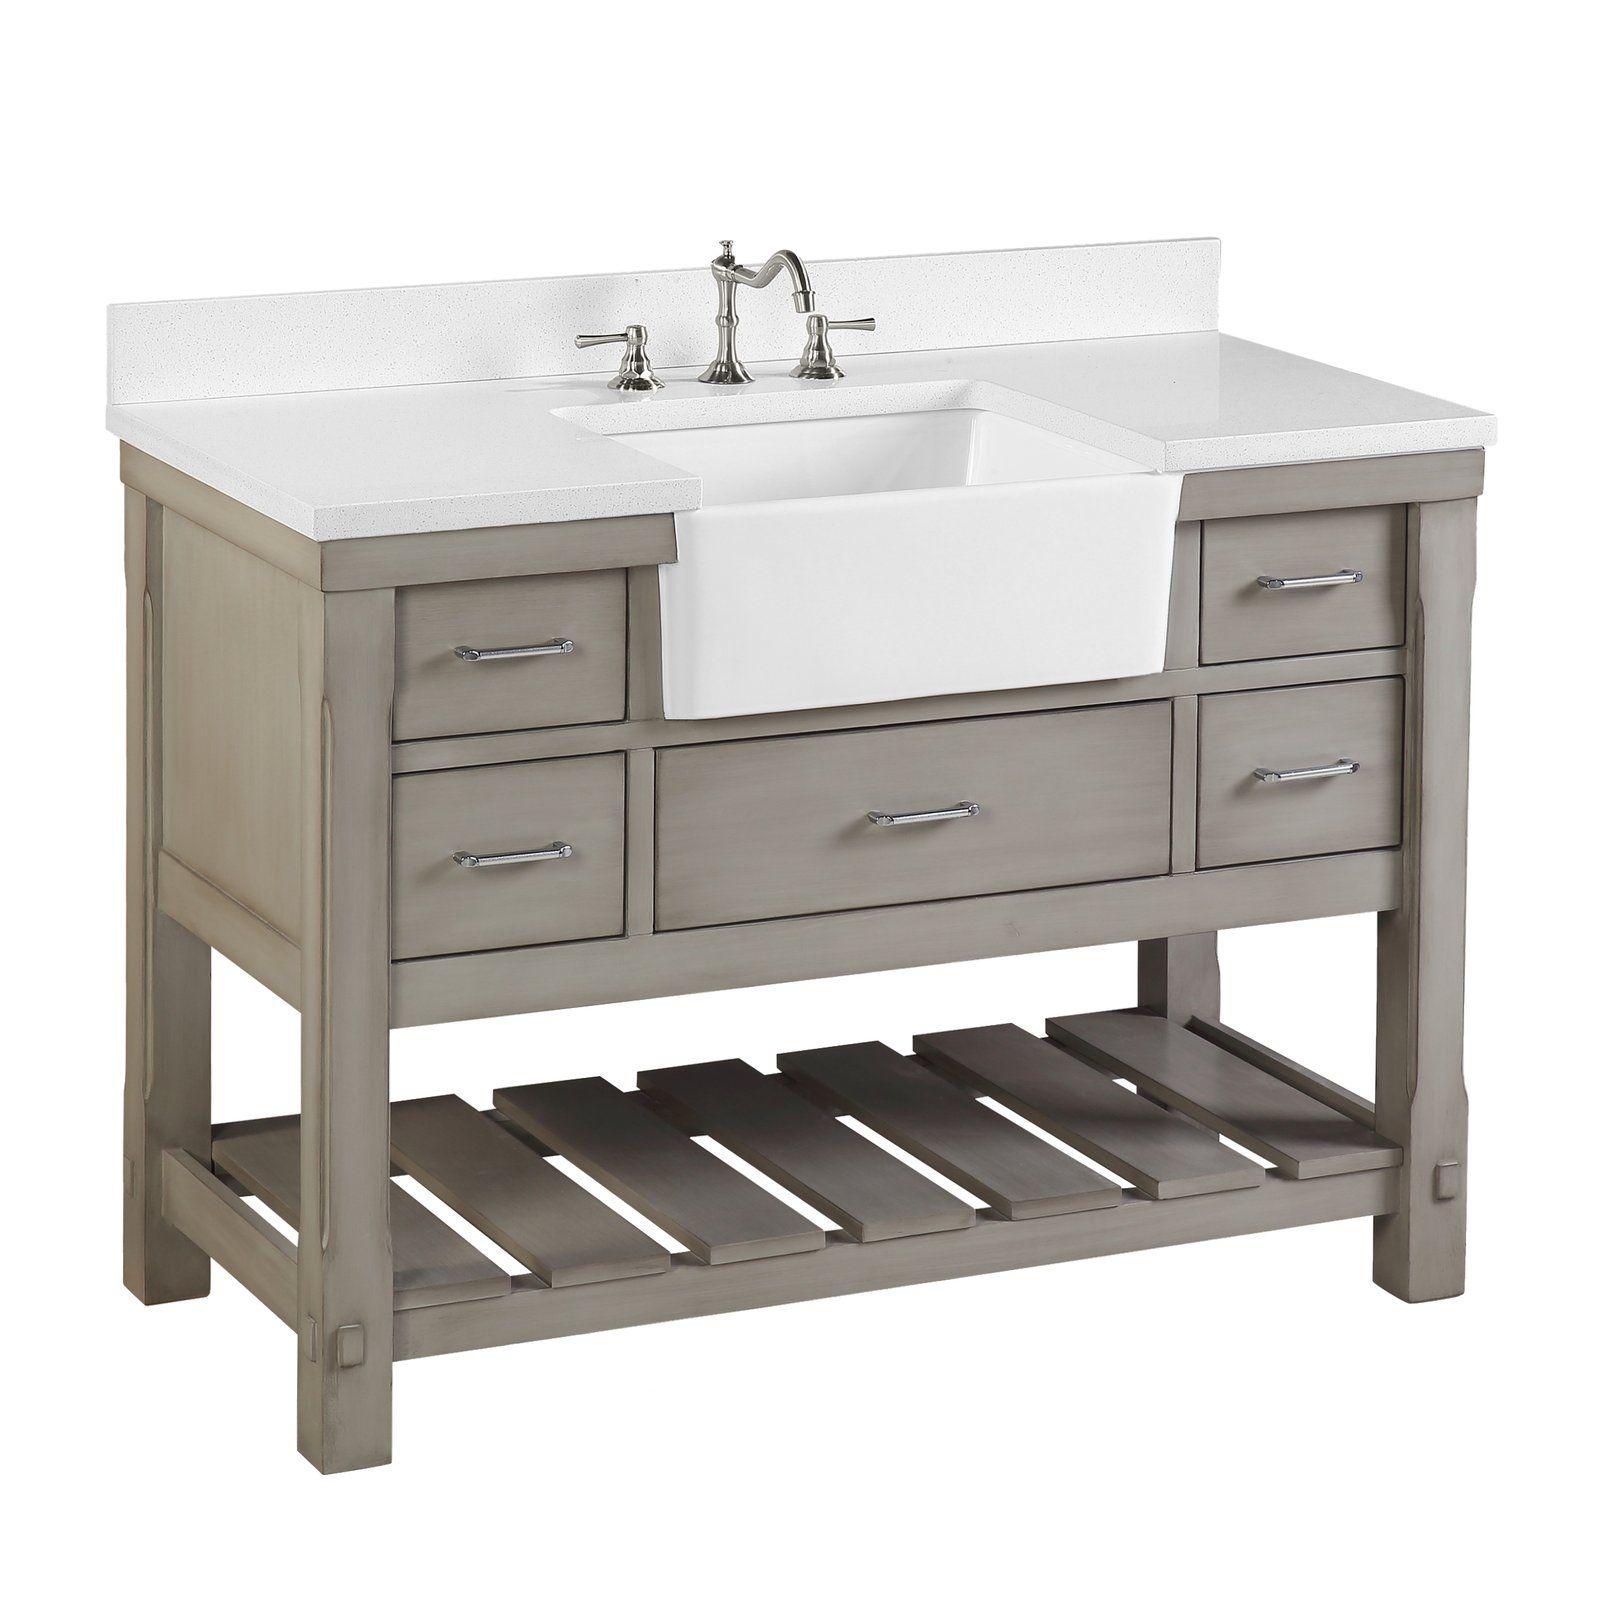 44+ Apron sink bathroom vanity ideas